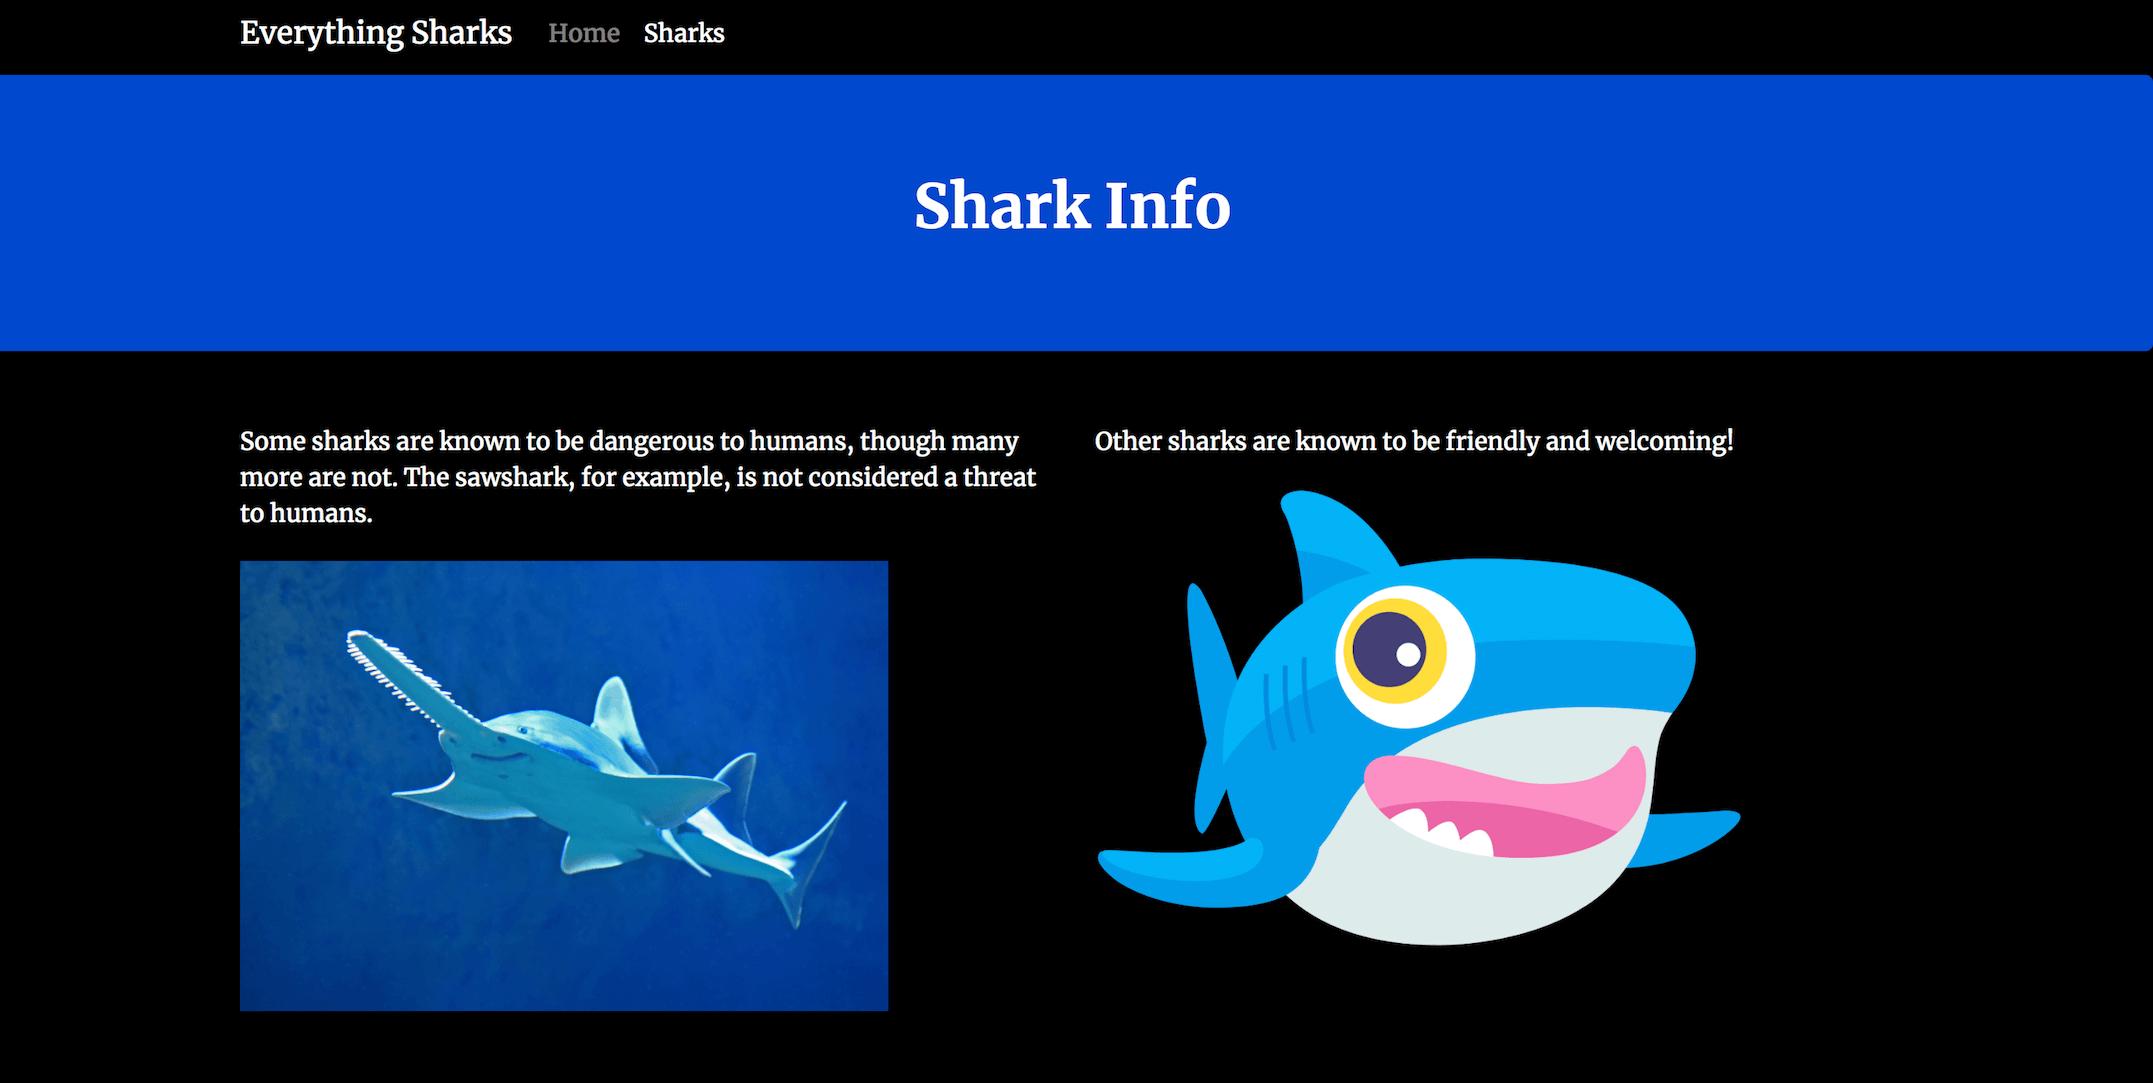 Страница информации об акулах